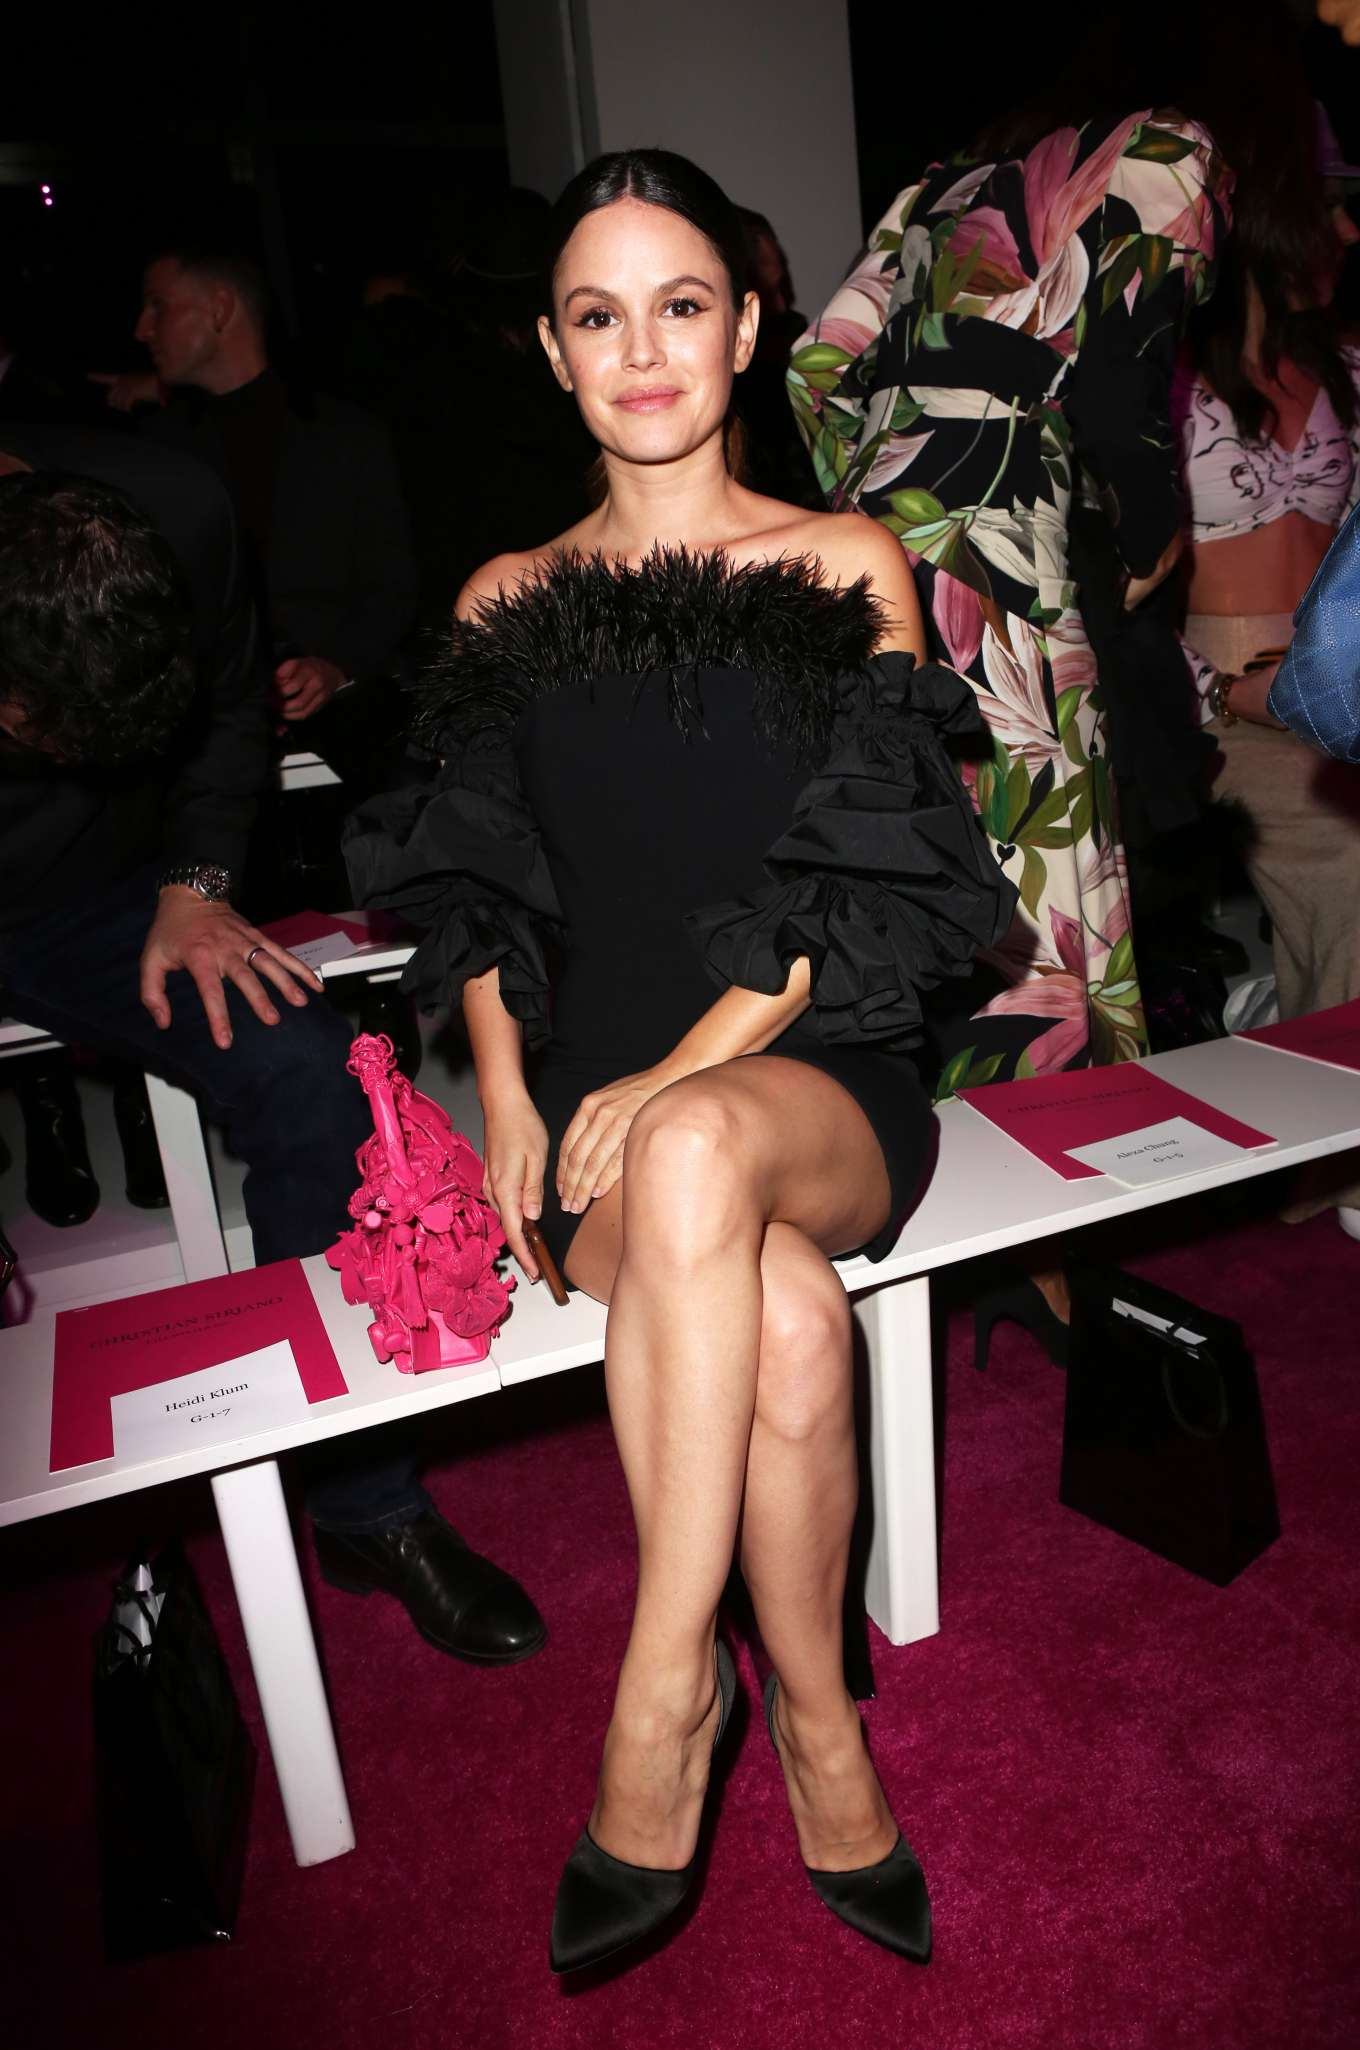 Rachel Bilson 2020 : Rachel Bilson – Christian Siriano Show at New York Fashion Week 2020-10